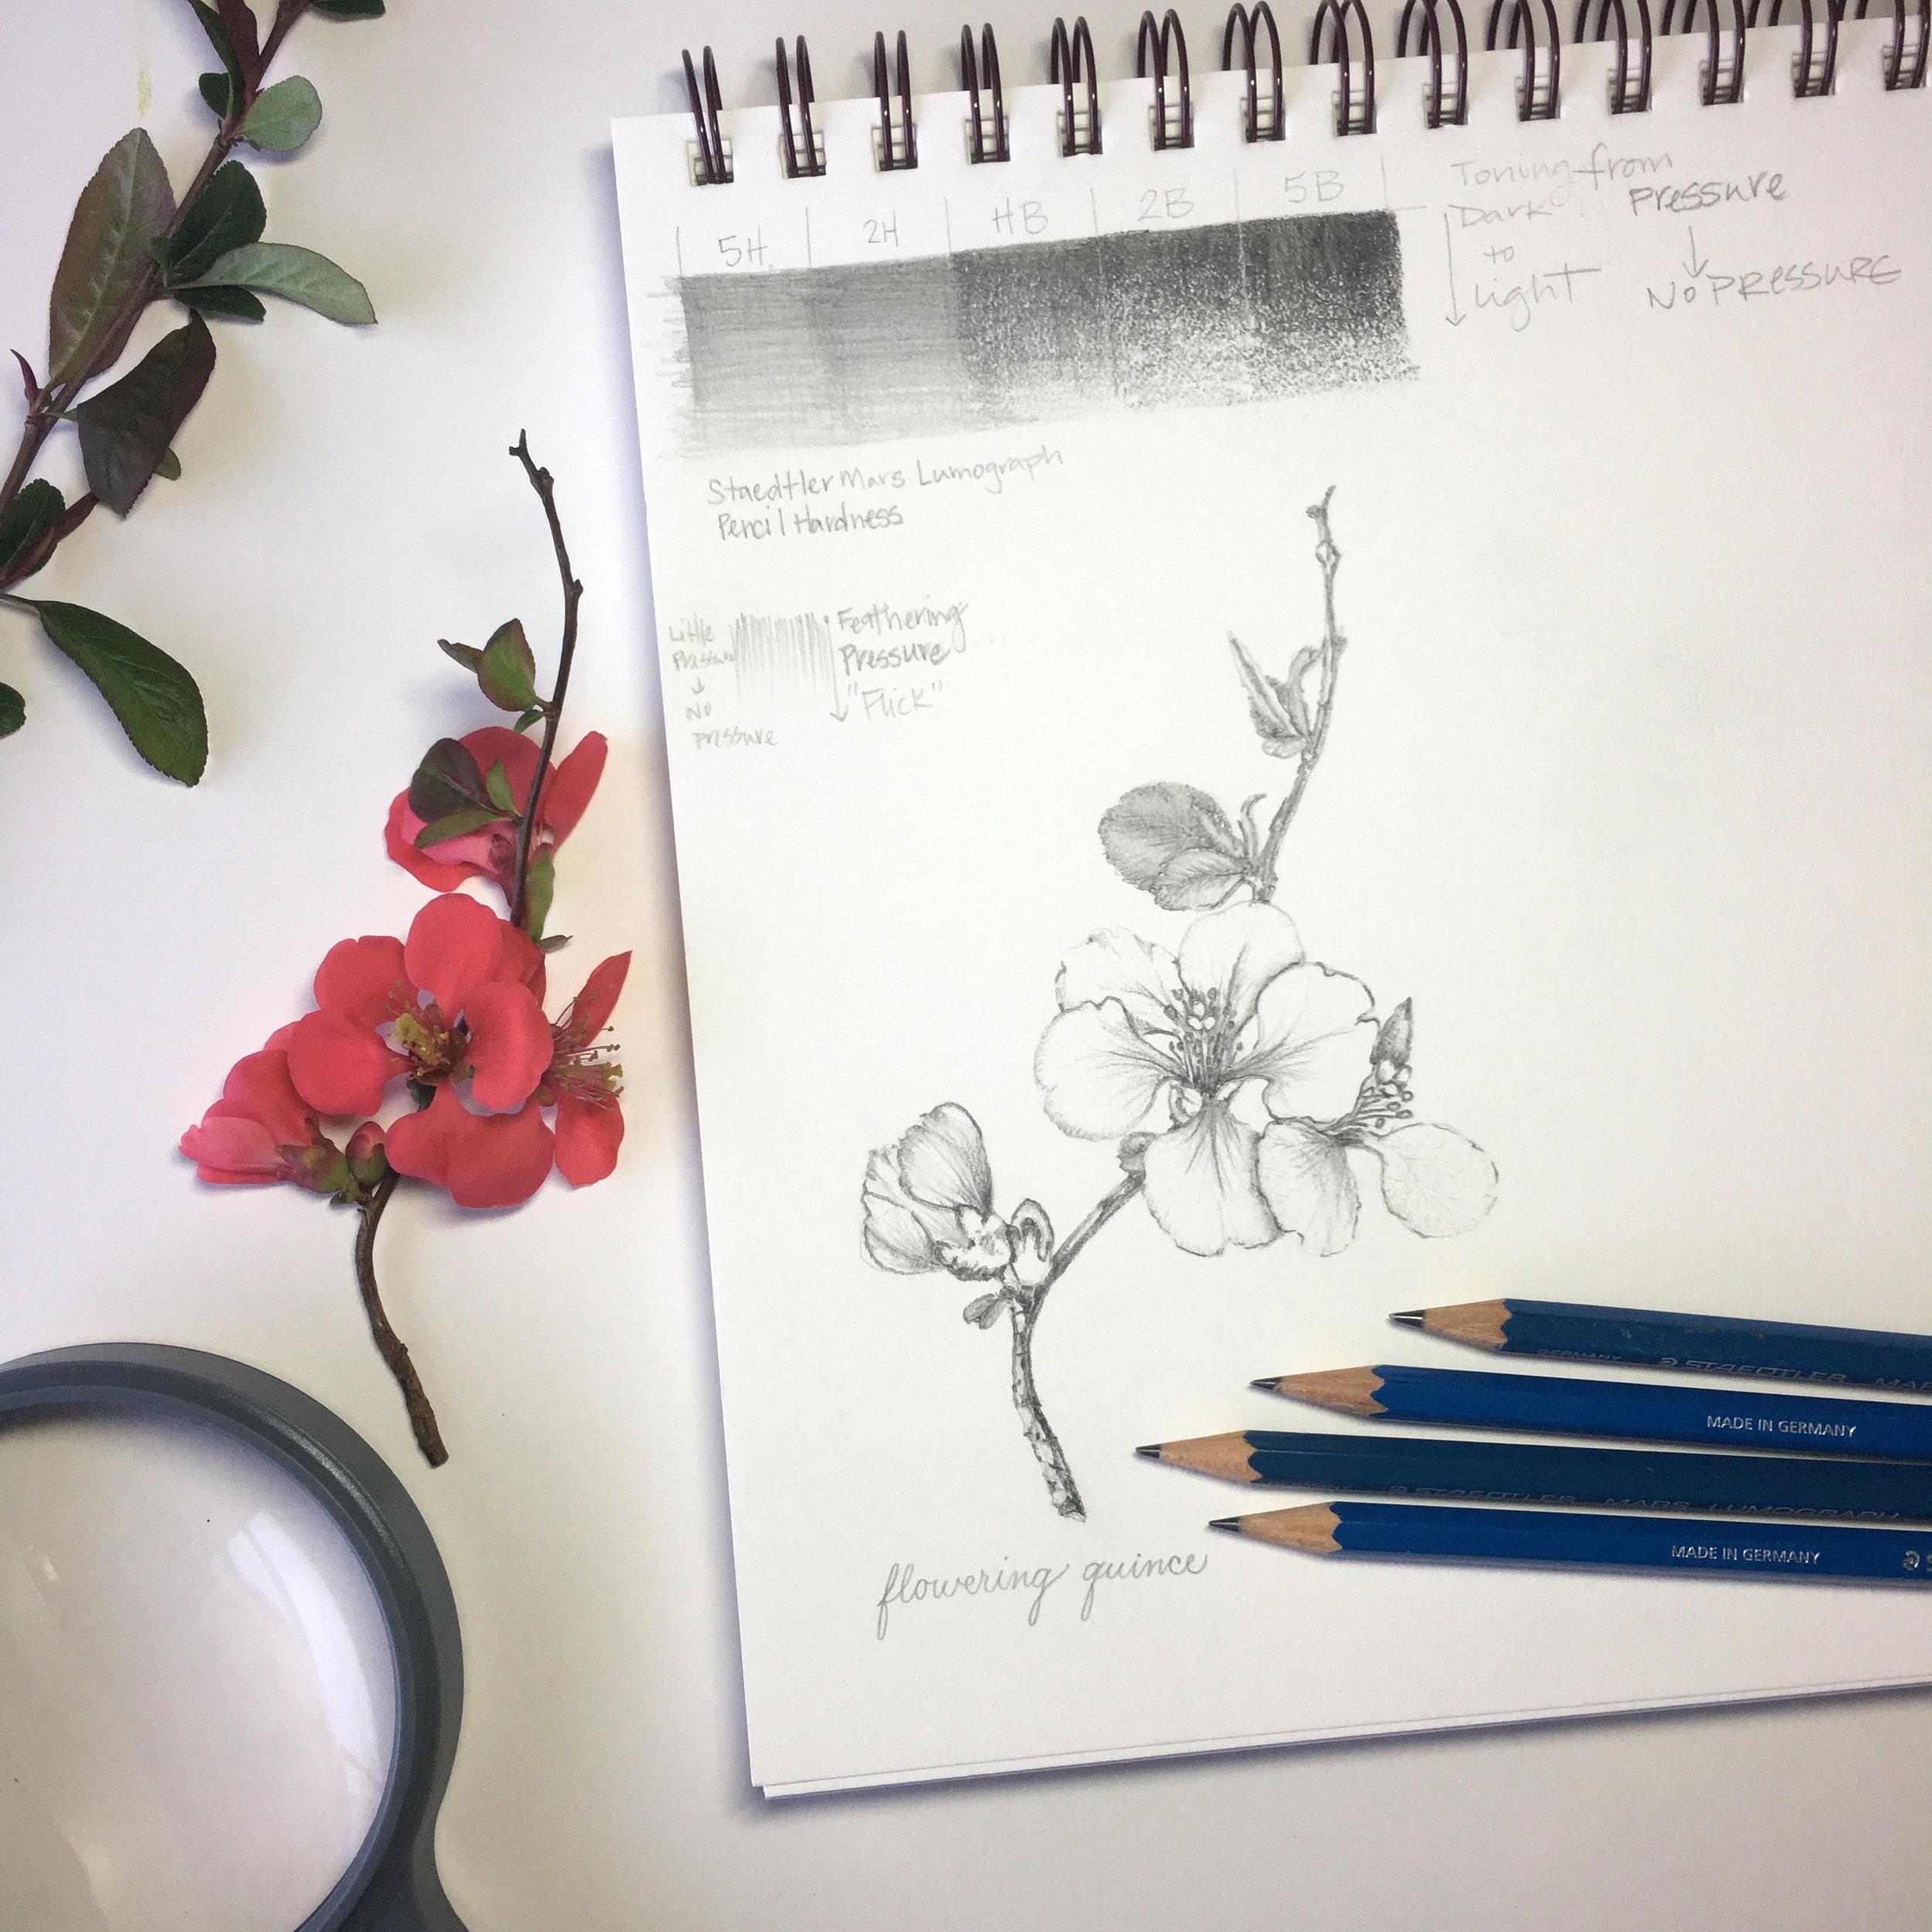 MirandaFuller-BotanicalArt101-floweringquince-Nashville.jpeg